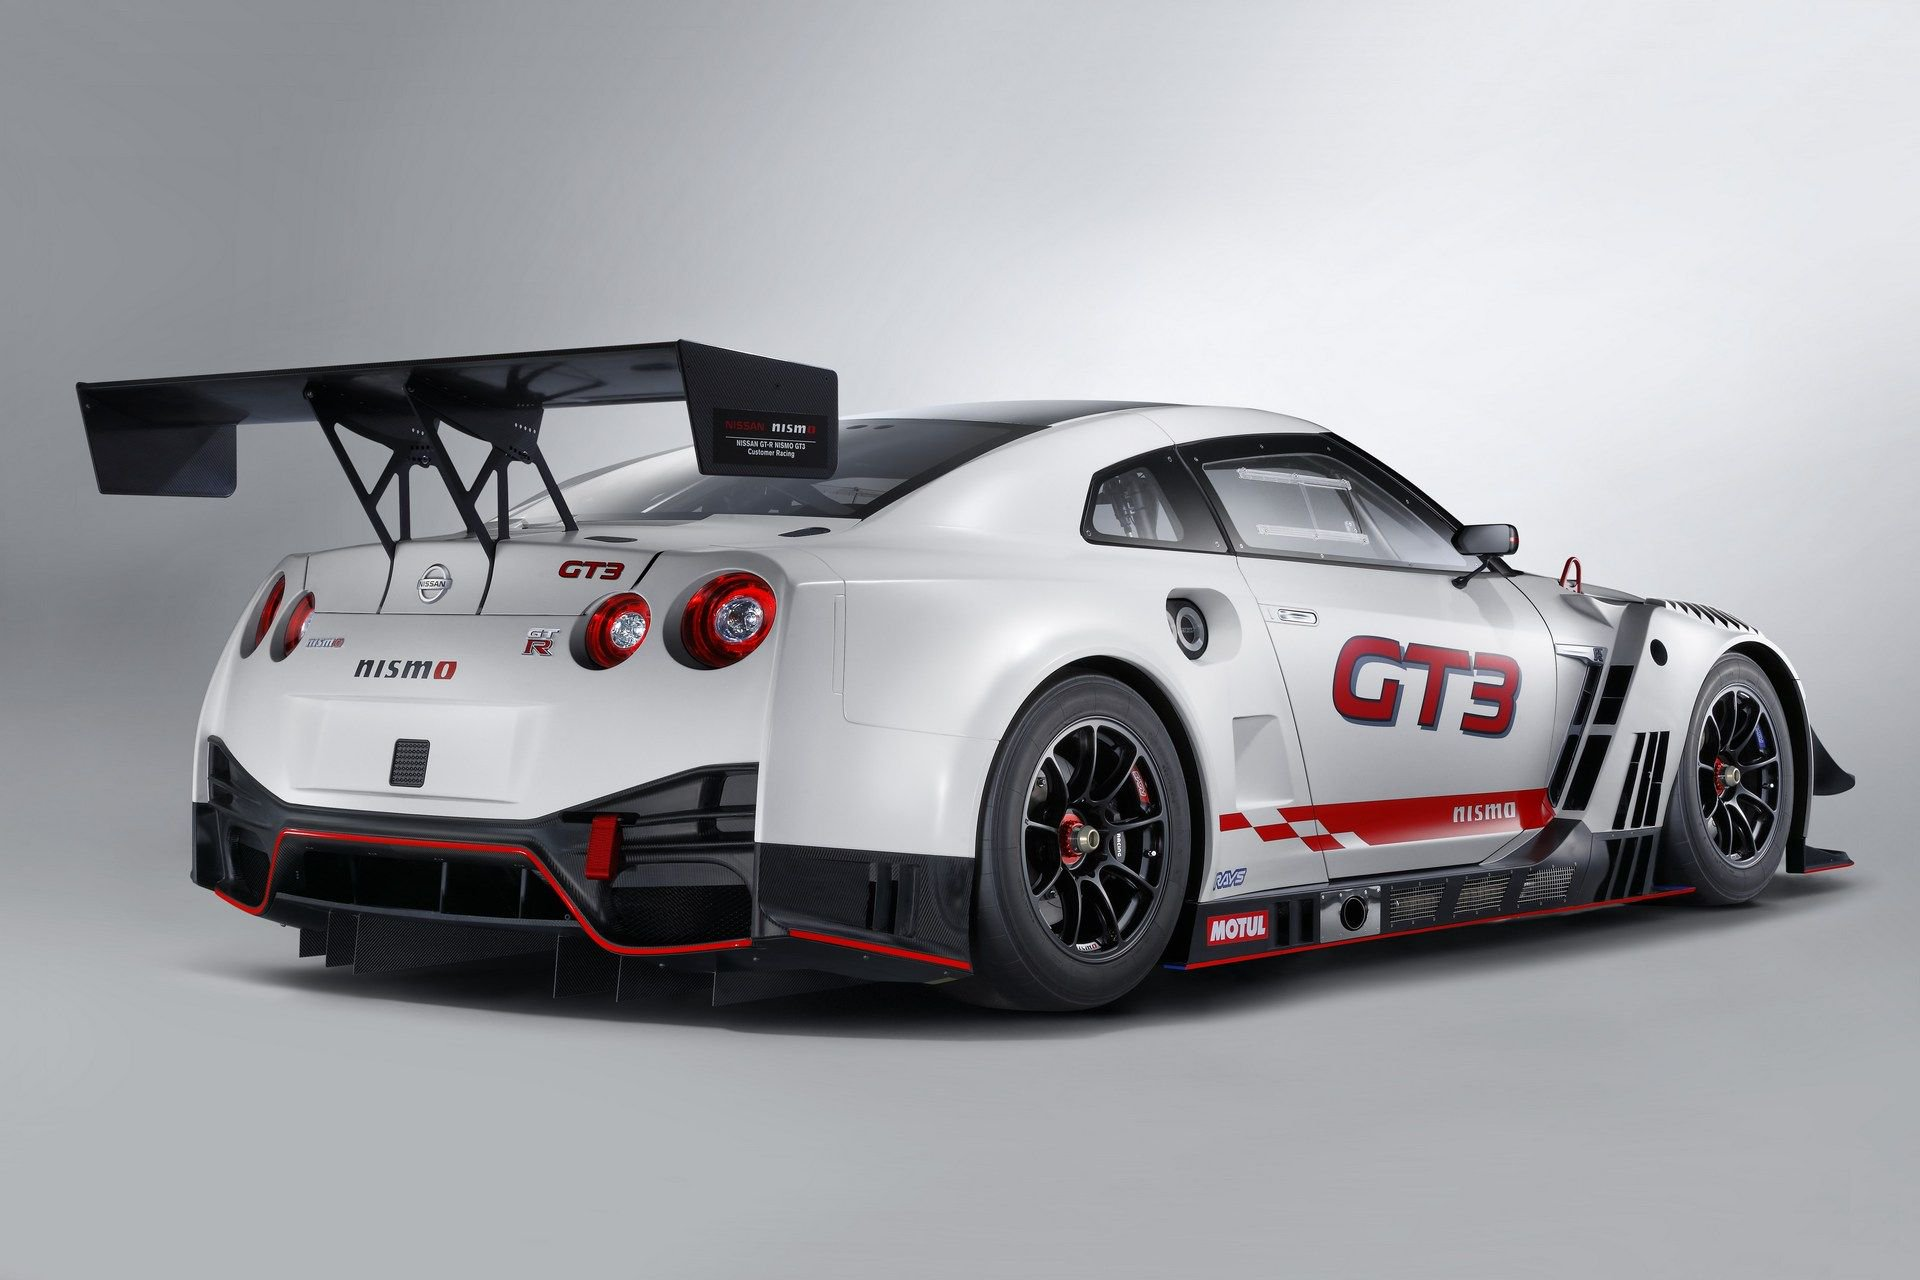 Nissan-GT-R-NISMO-GT3-6 (1)